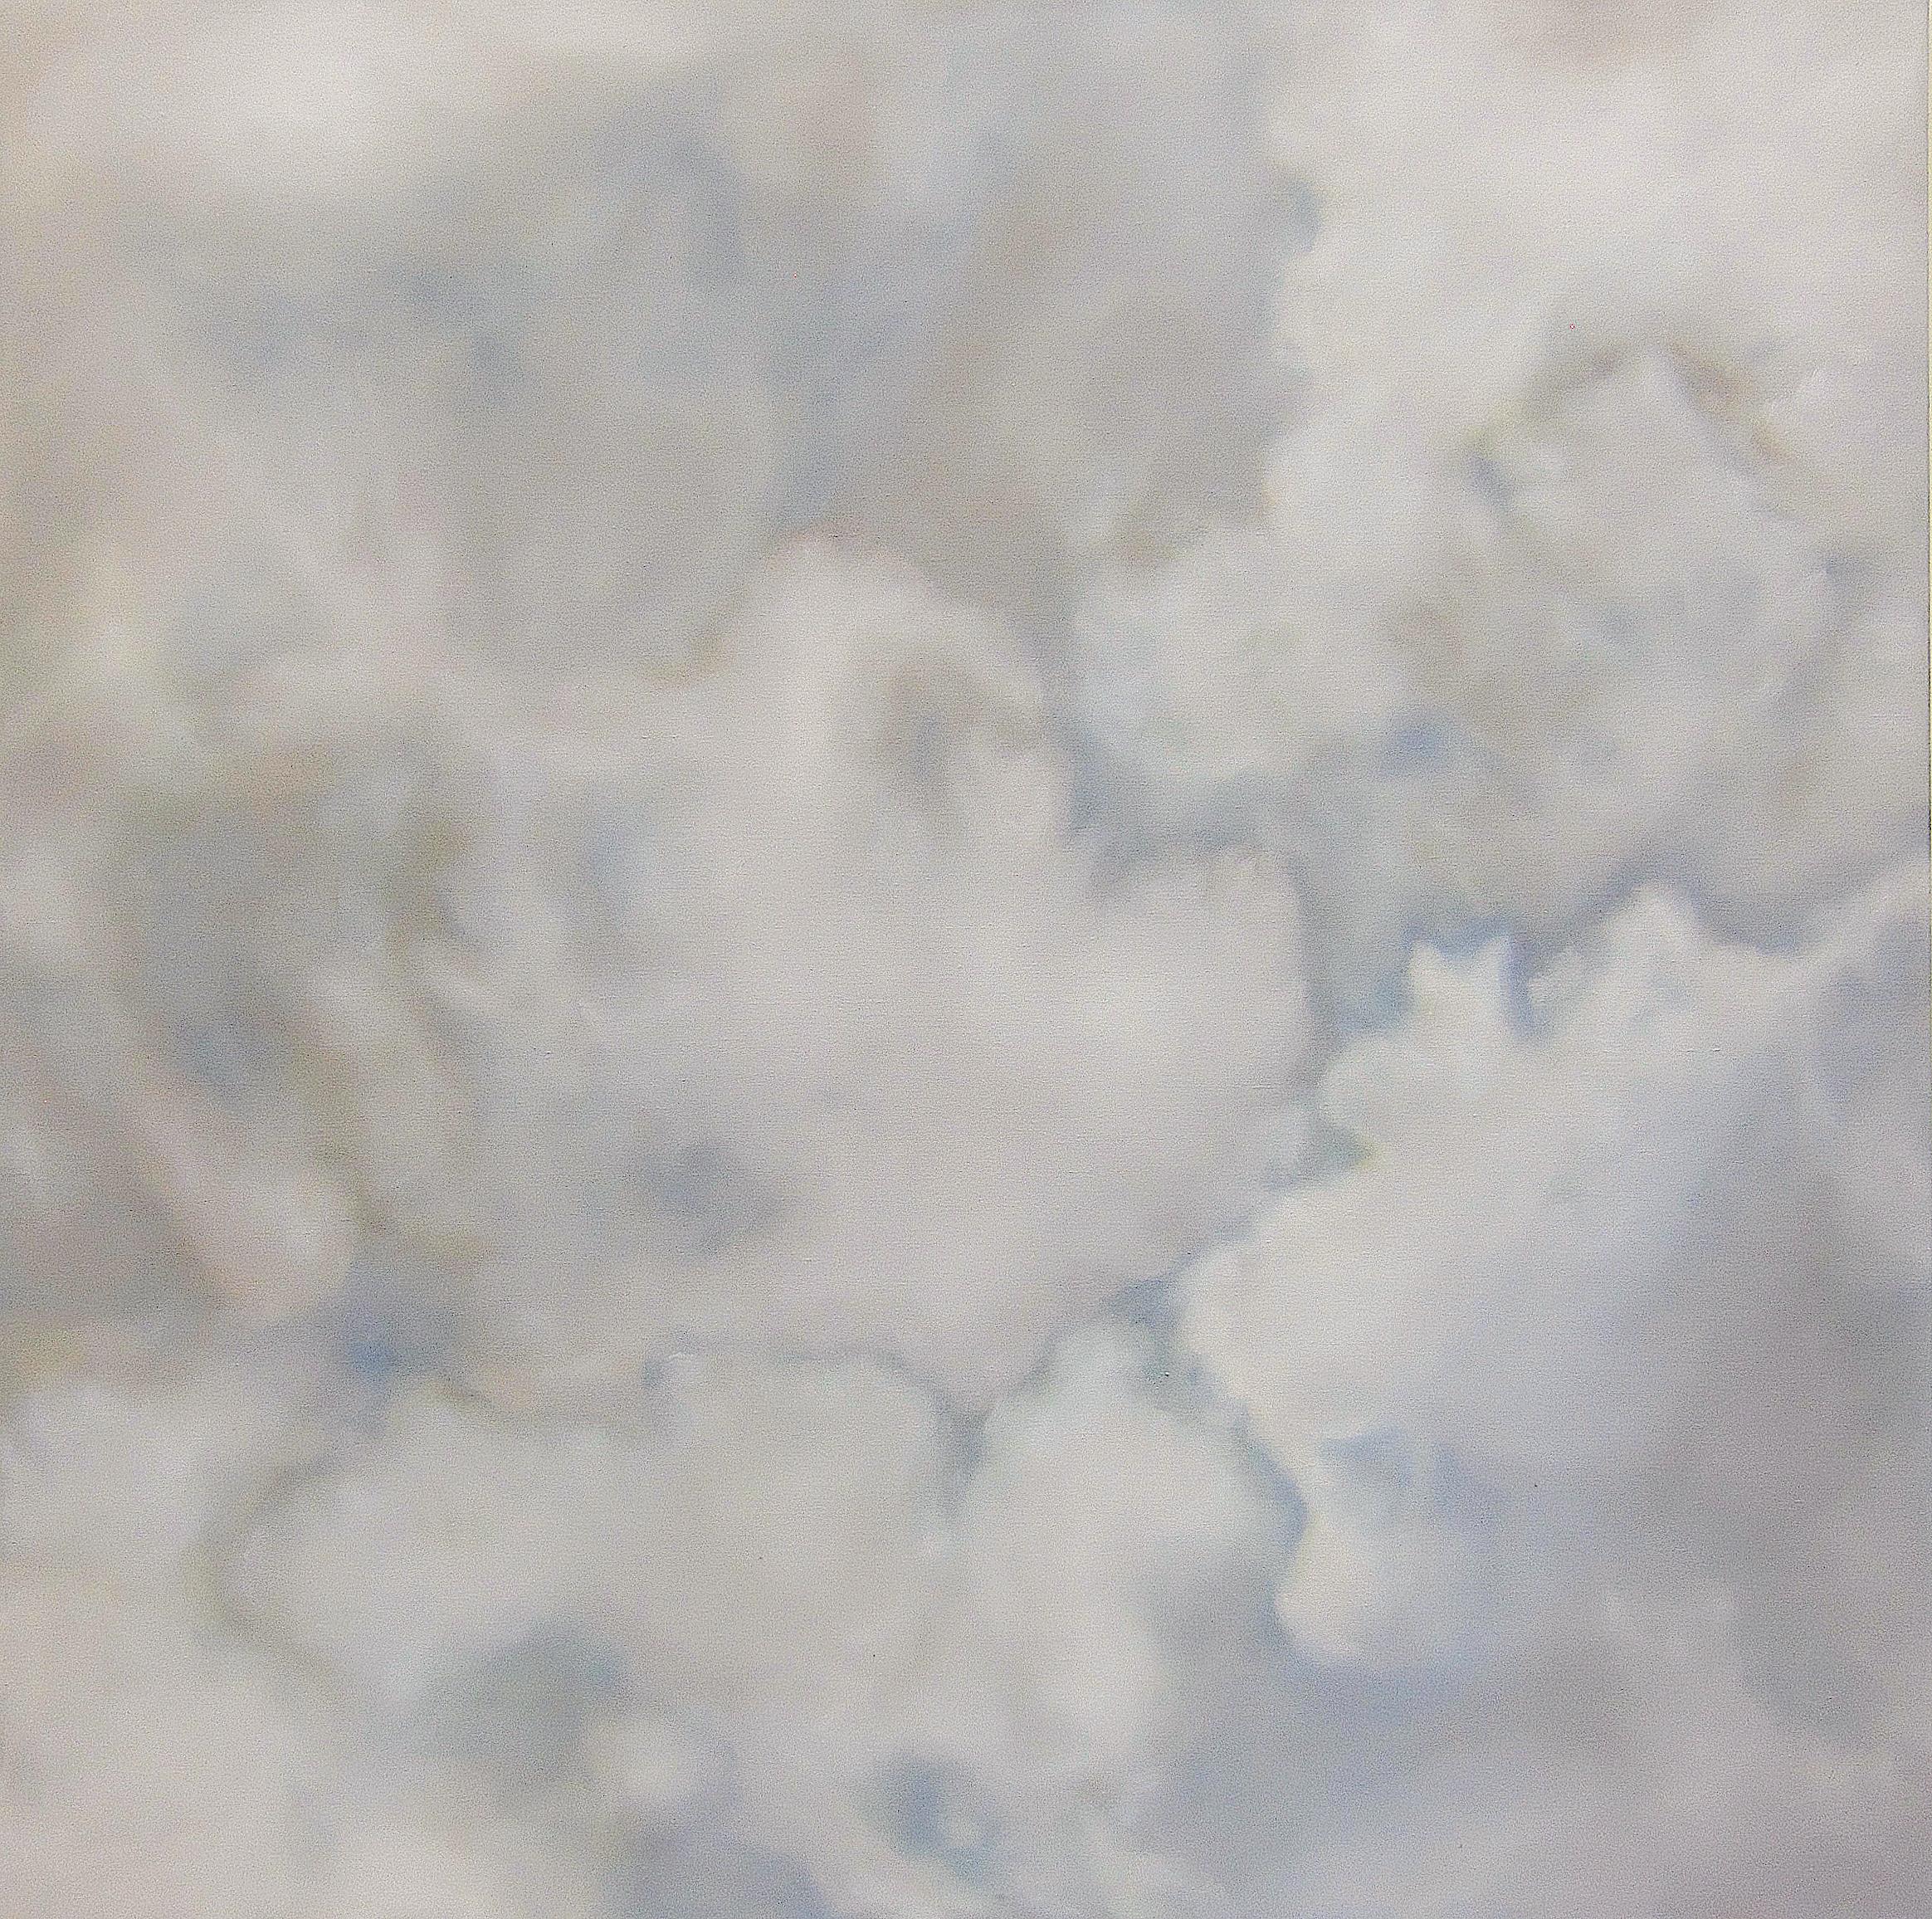 Ciel Sensible , 2017  oil on linen, 63 x 63 in, 160 x 160 cm